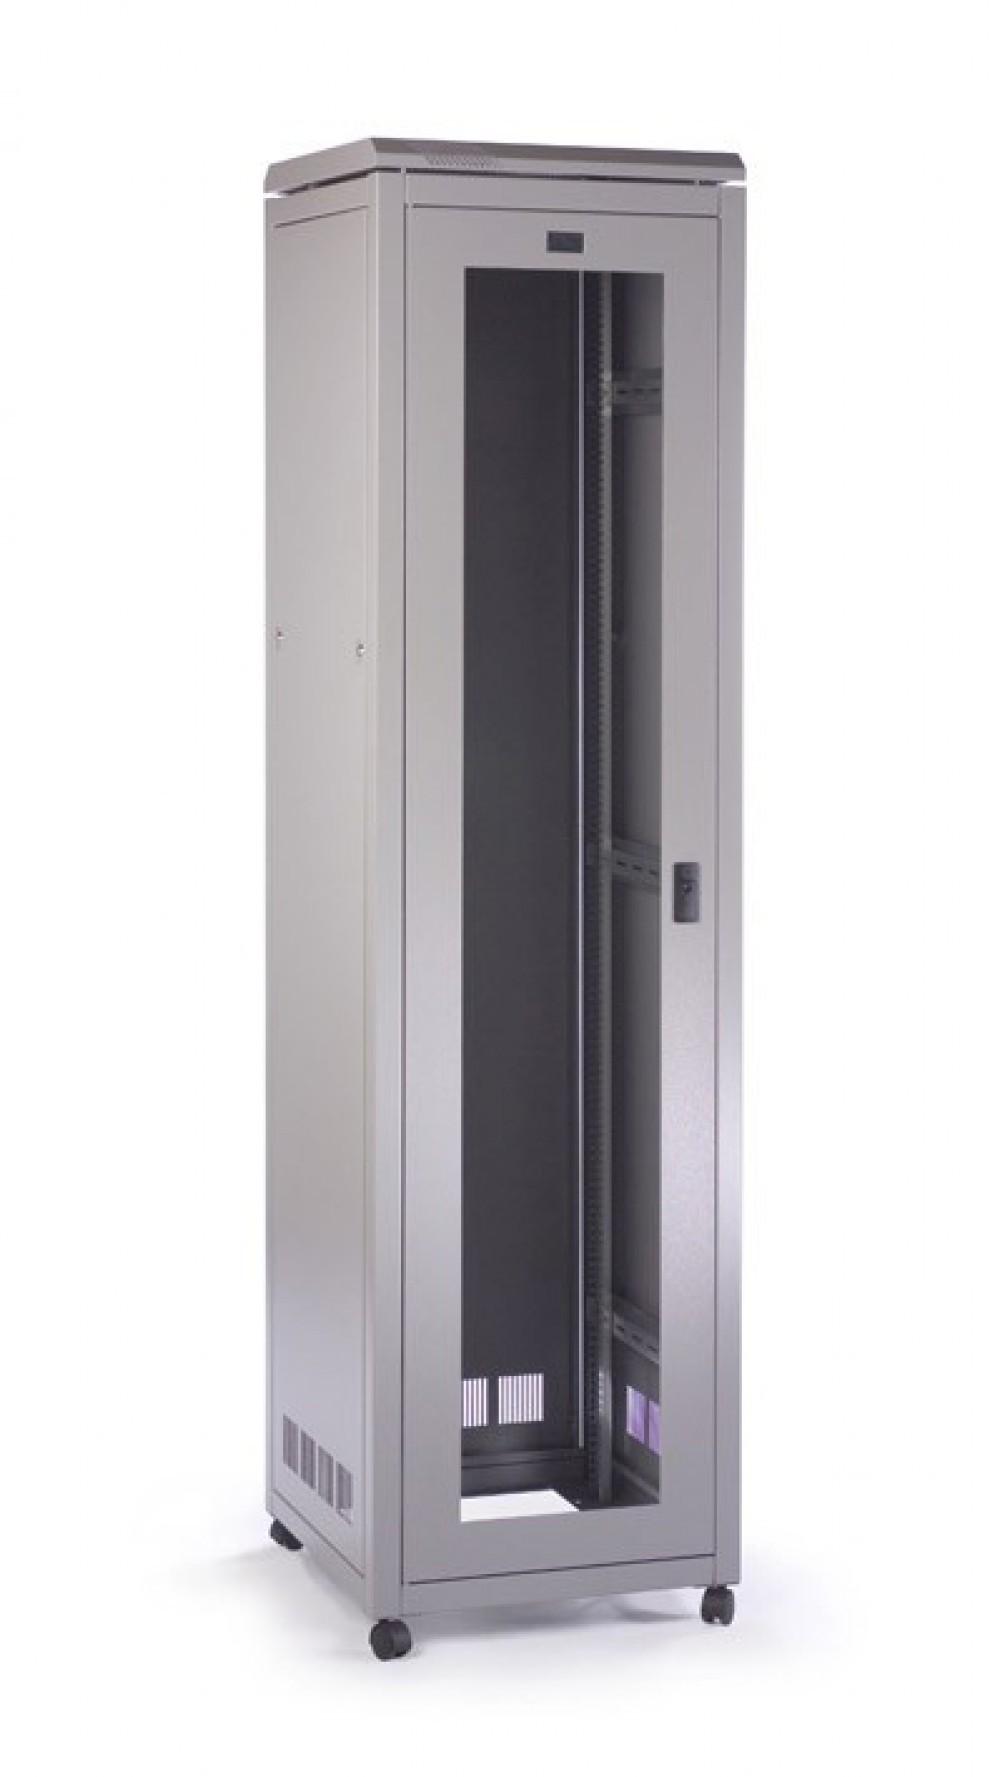 Prism Free Standing Cabinet 47U (2295x600x800)